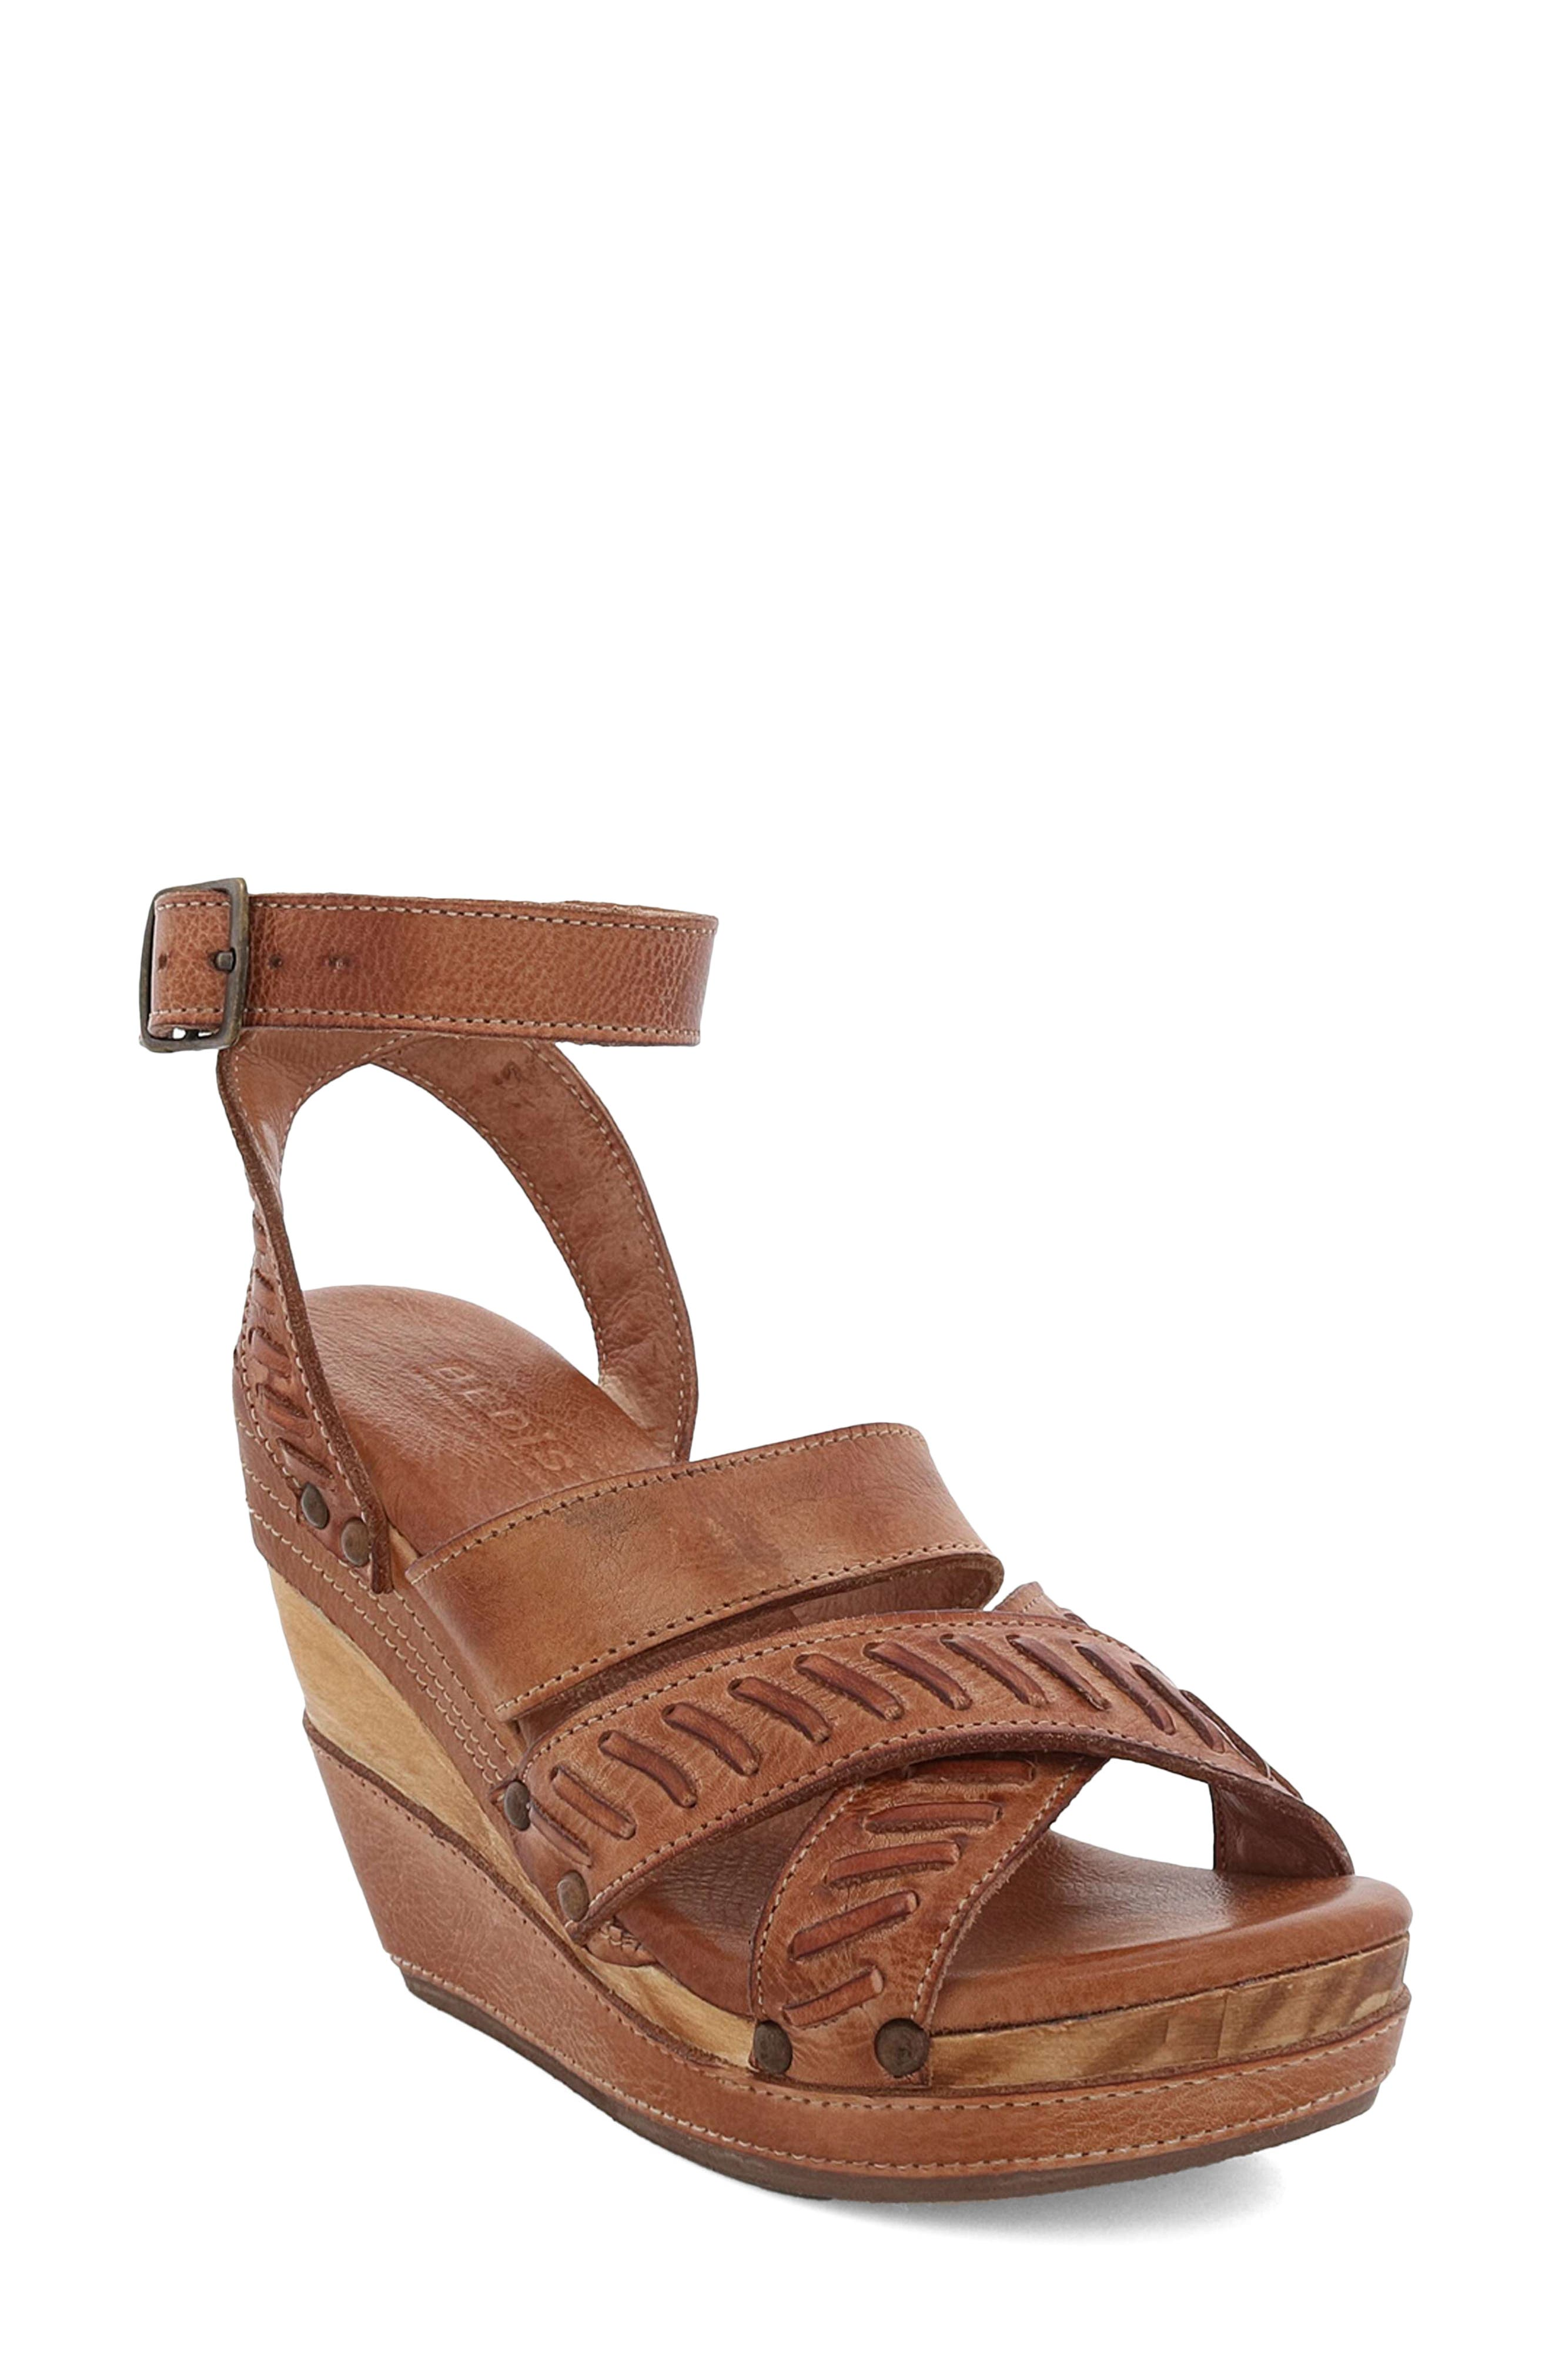 Kaphie Wedge Sandal